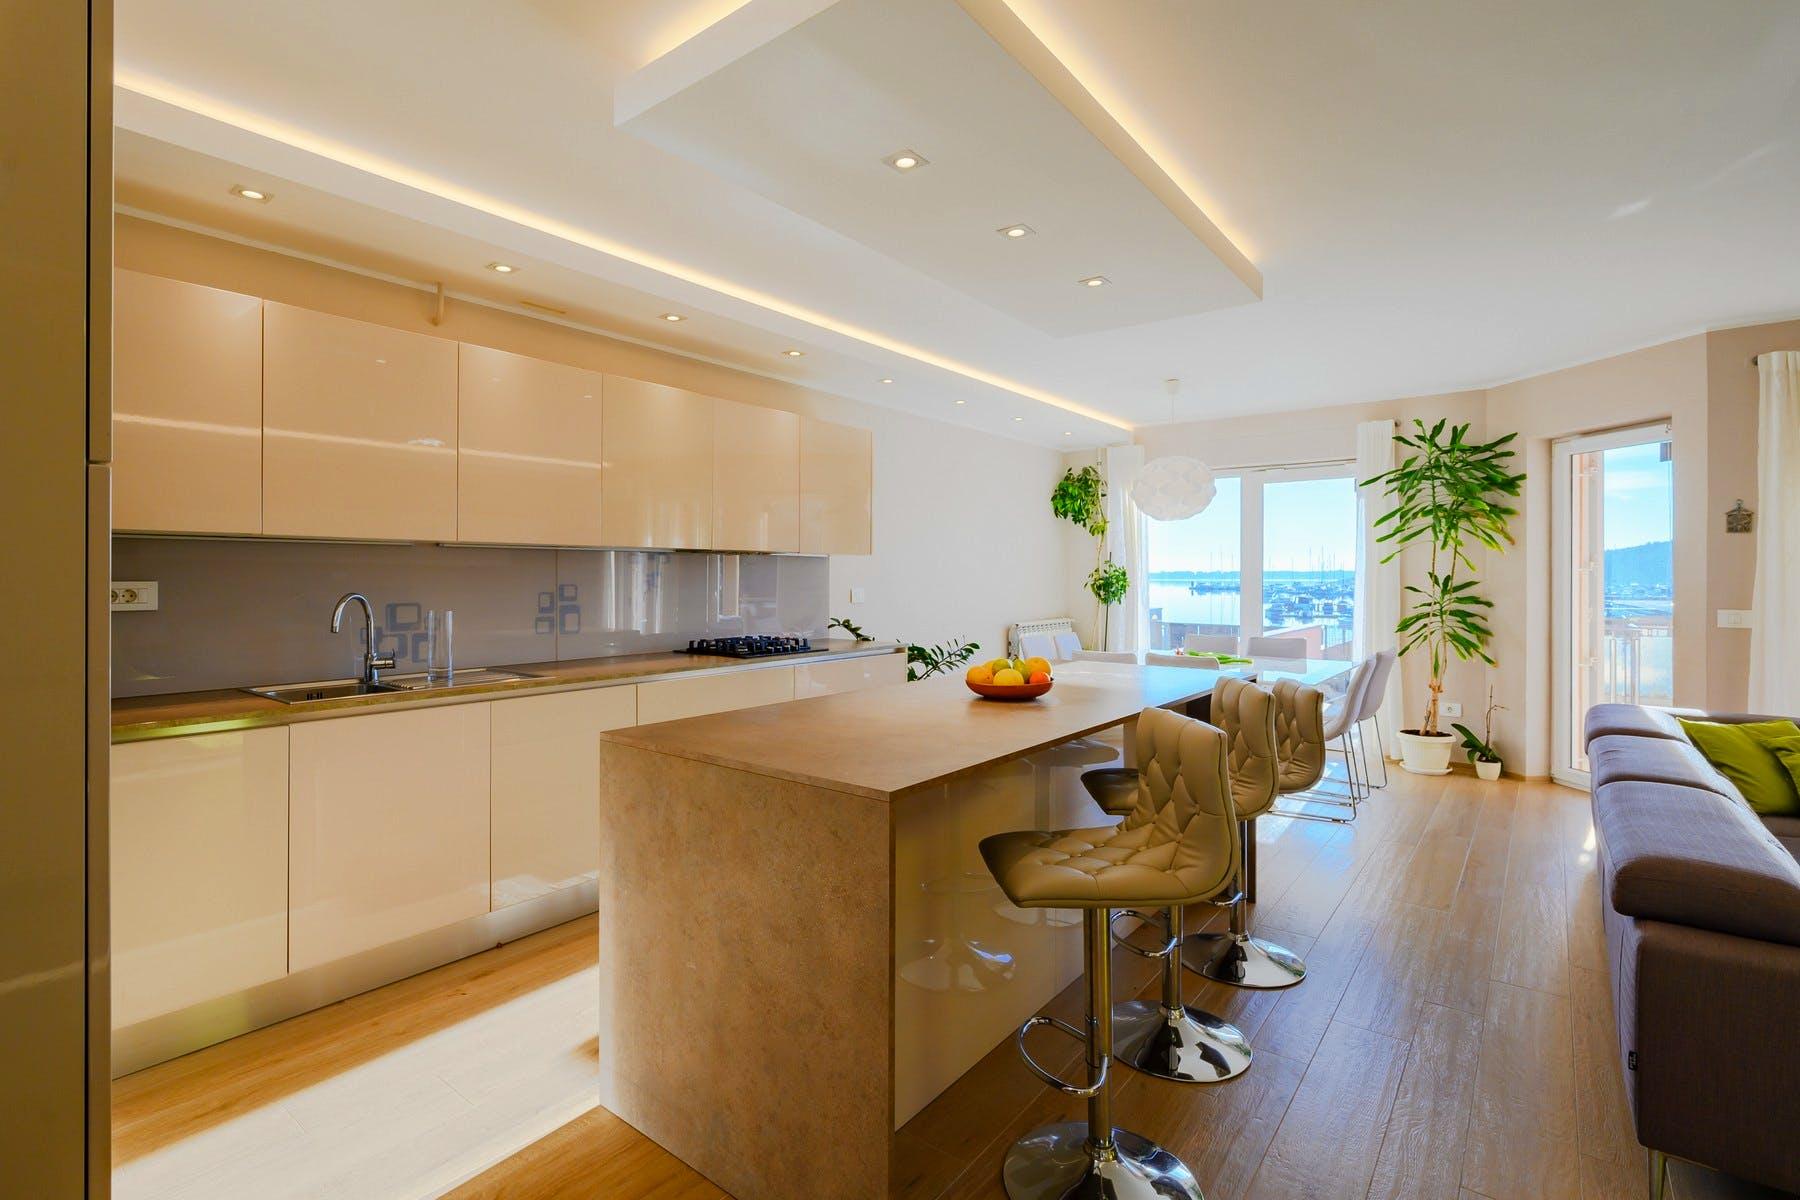 Velika kuhinja s otokom i blagovaonskim stolom za osam osoba